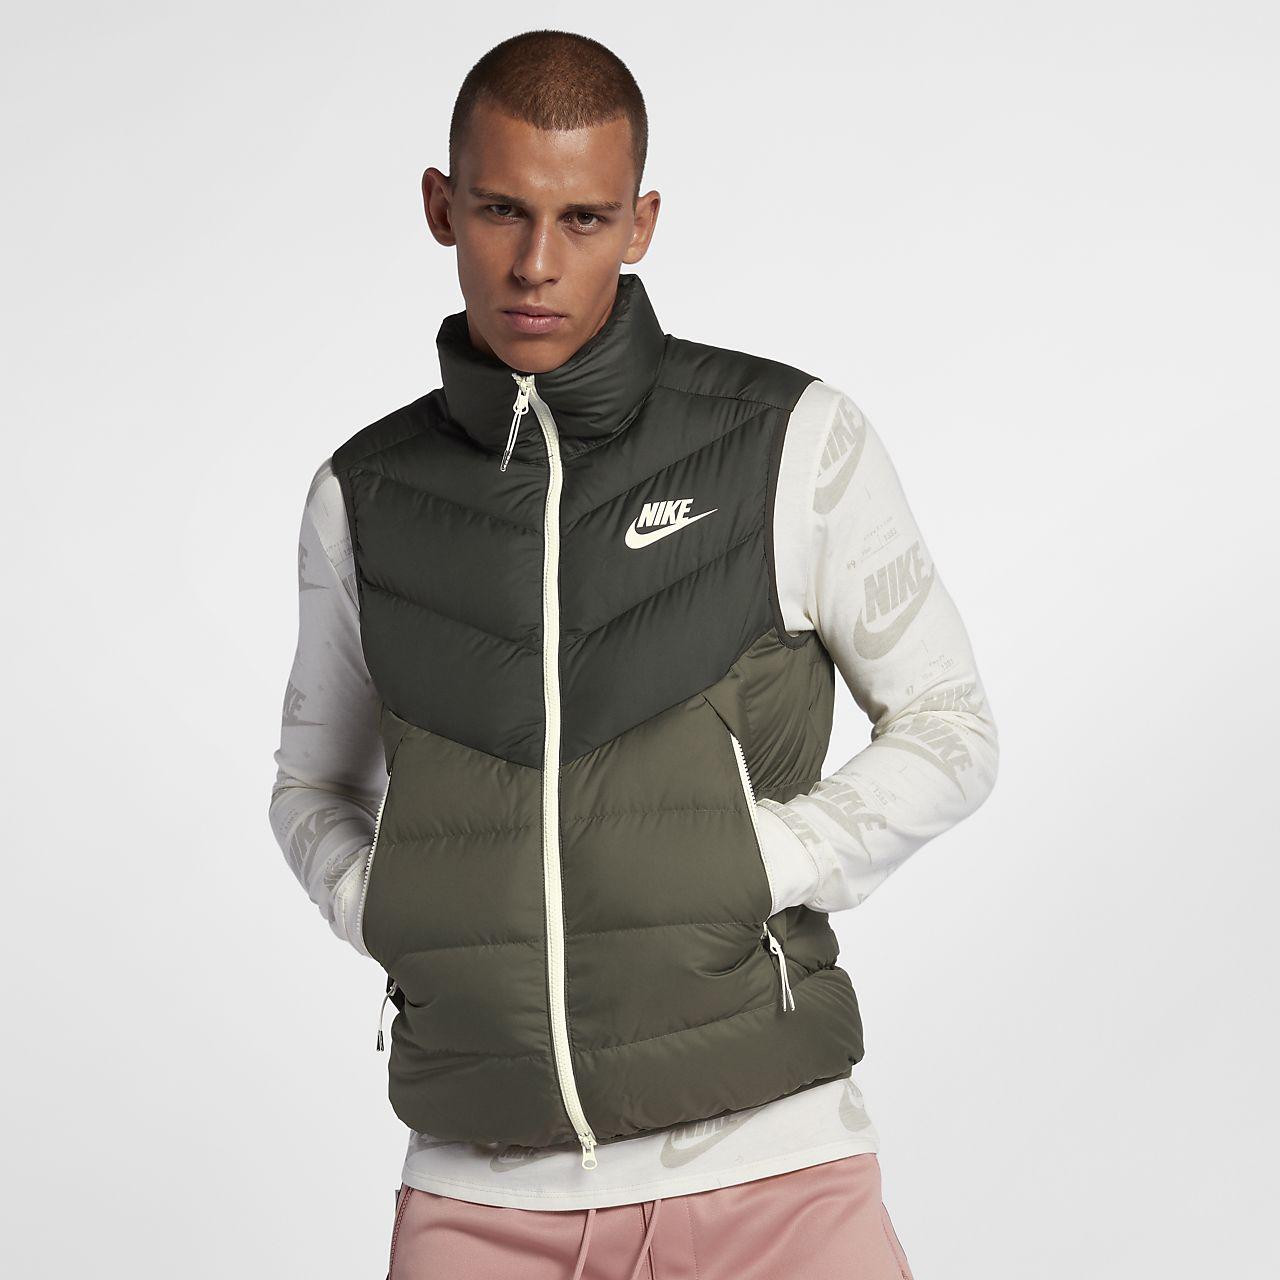 8b91d94c969b Nike Sportswear Windrunner Down Fill Men s Gilet. Nike.com GB